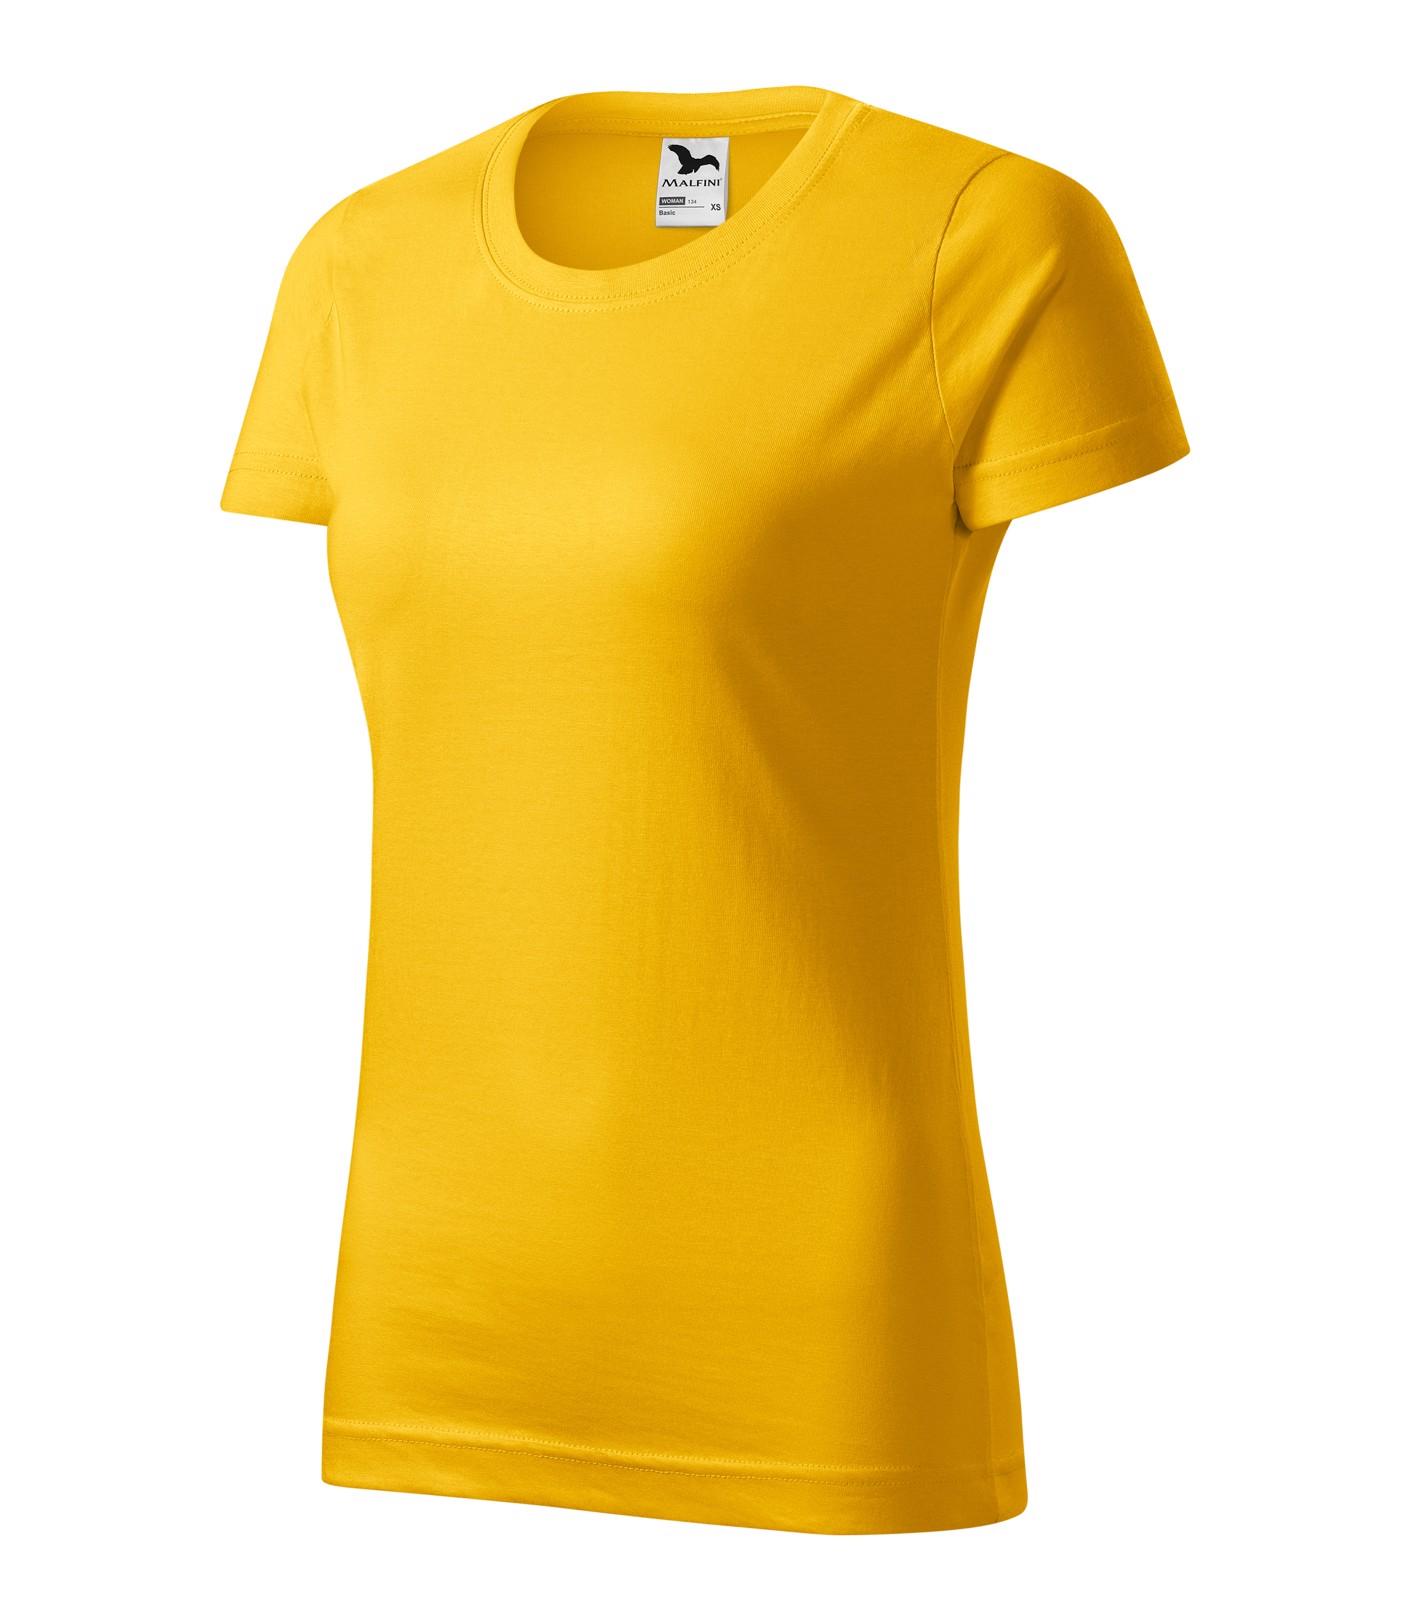 T-shirt women's Malfini Basic - Yellow / 2XL